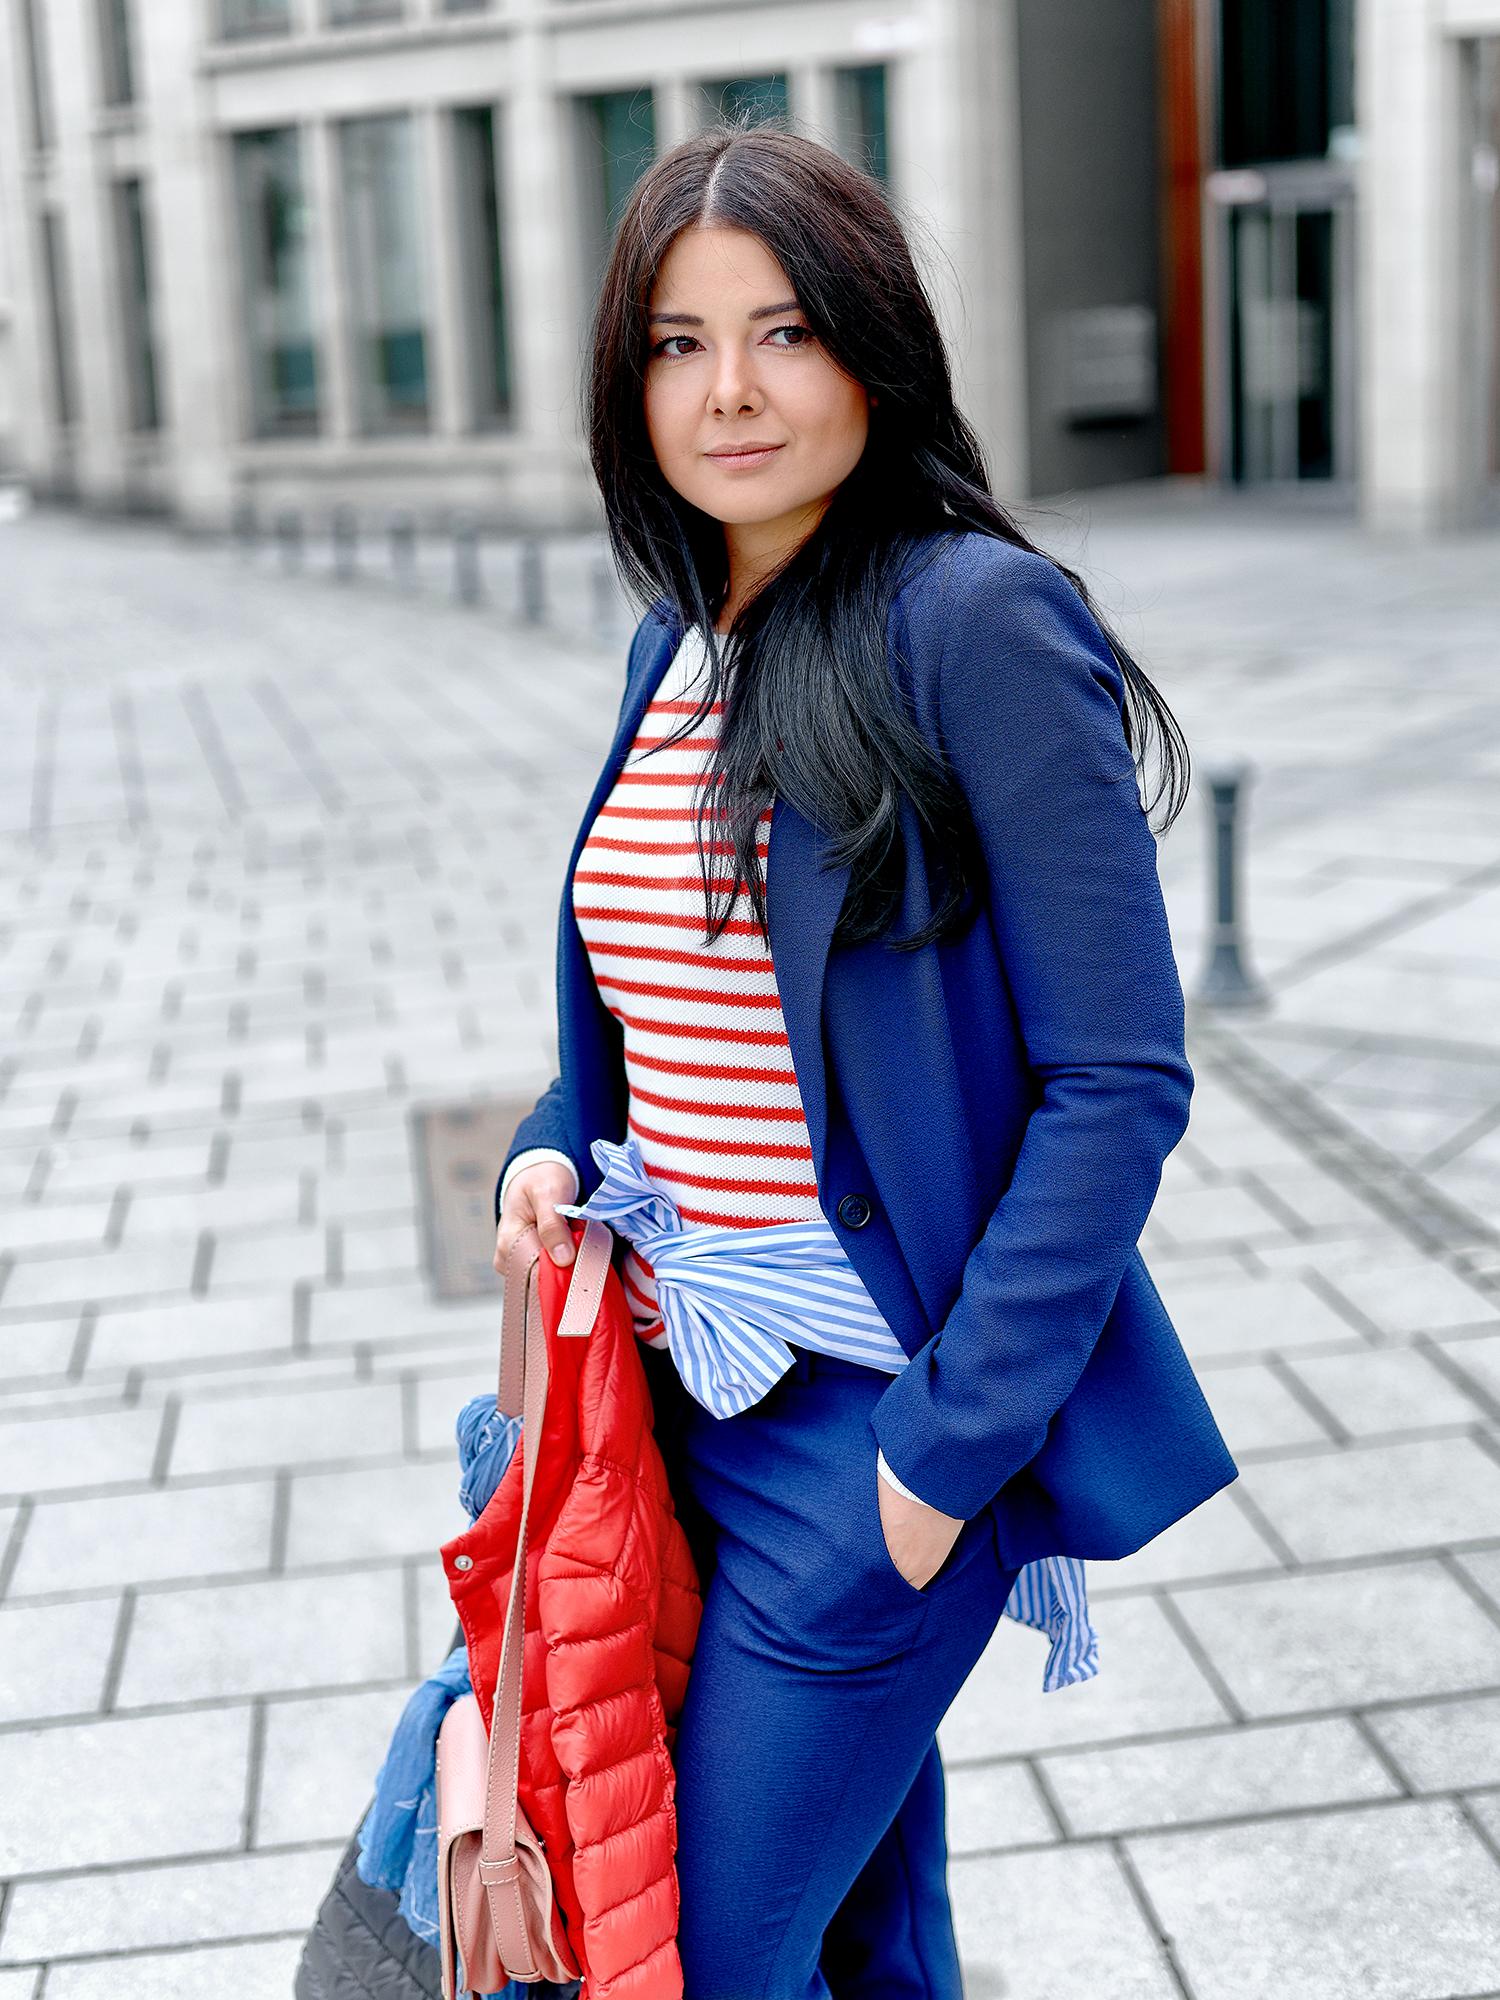 fashionambit-fashionblog-muenchen-modeblog-deutschland-blogger-modeblogger-fashionblogger-bloggerdeutschland-lifestyleblog-munich-style-blog-büro-outfit